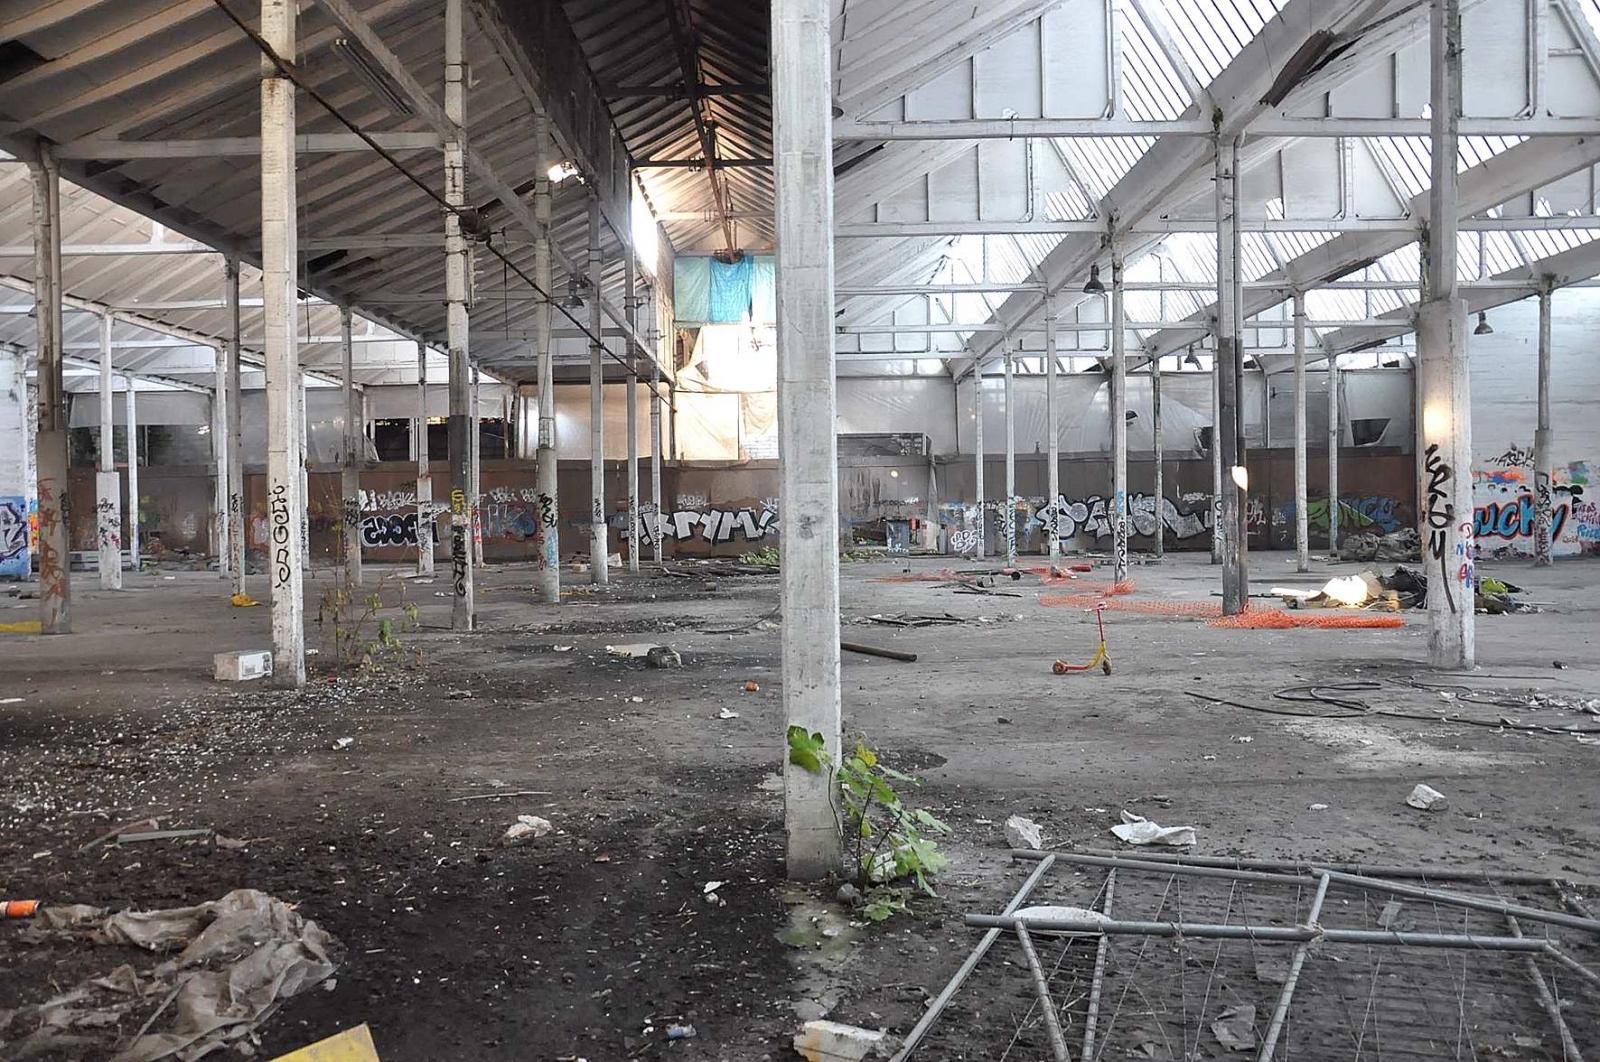 floirac, 31 decembre 2014 (1)